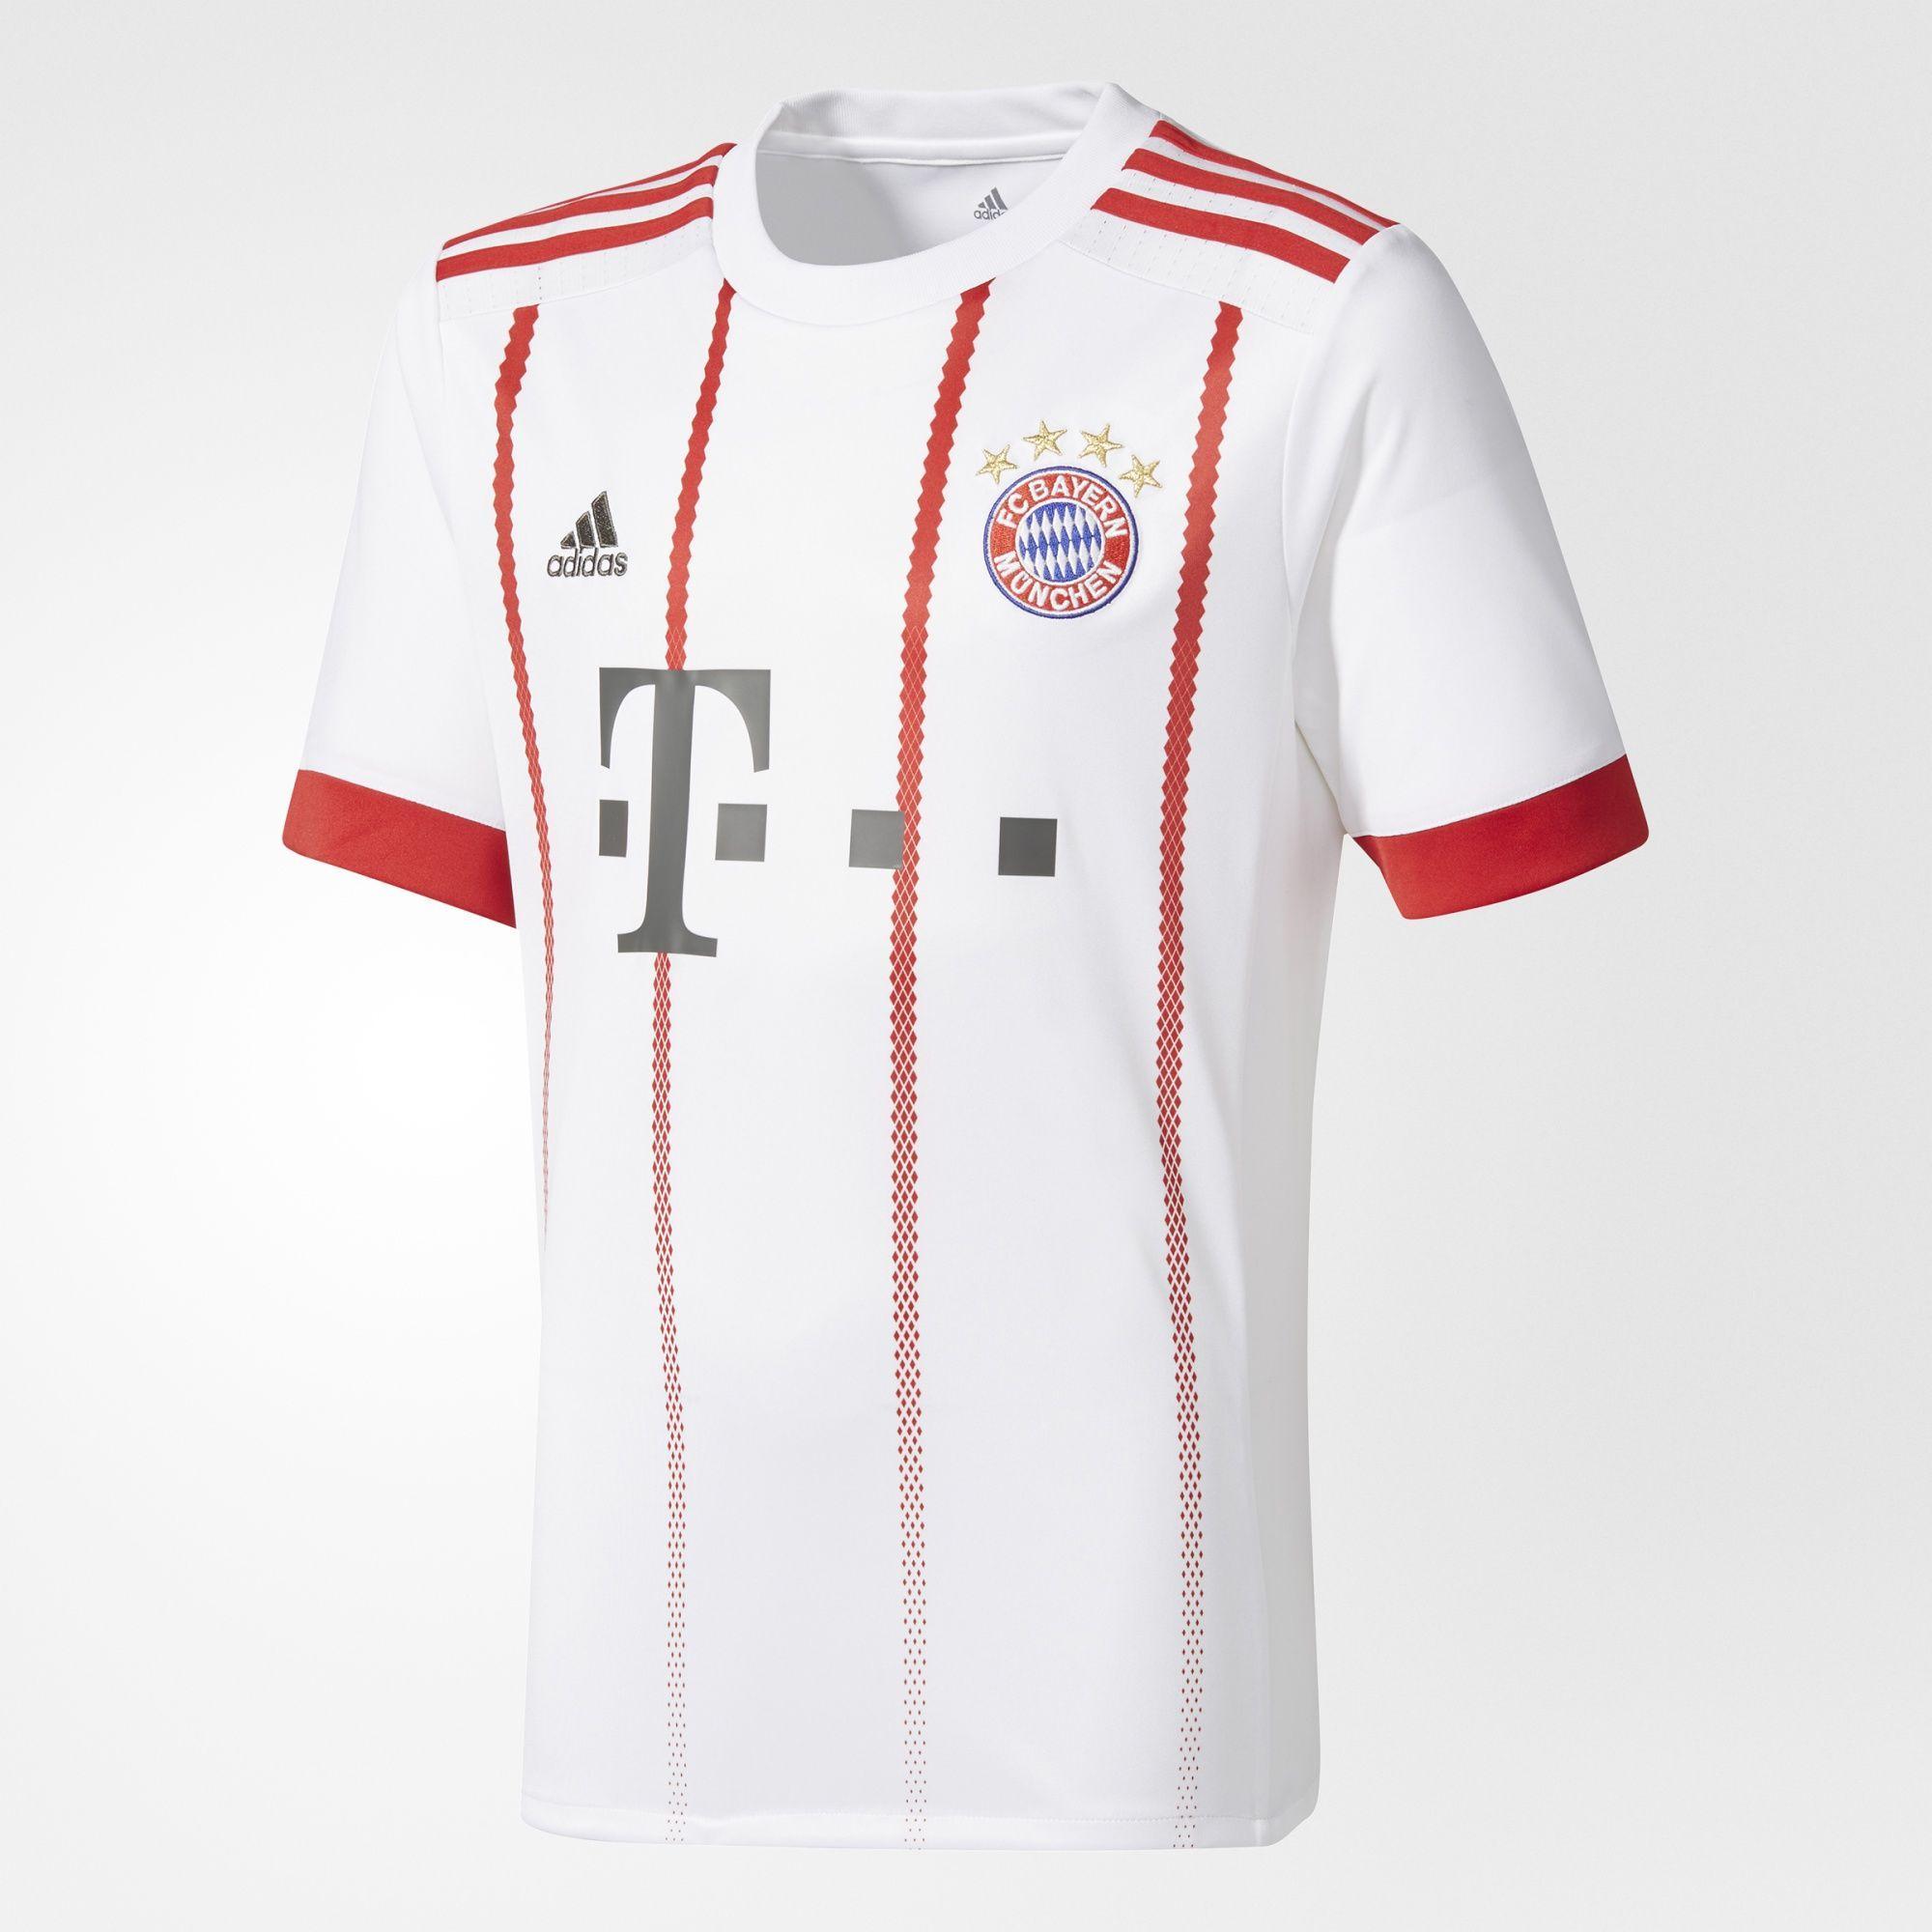 Kinder FC Bayern Munich UCL Replica Jersey,